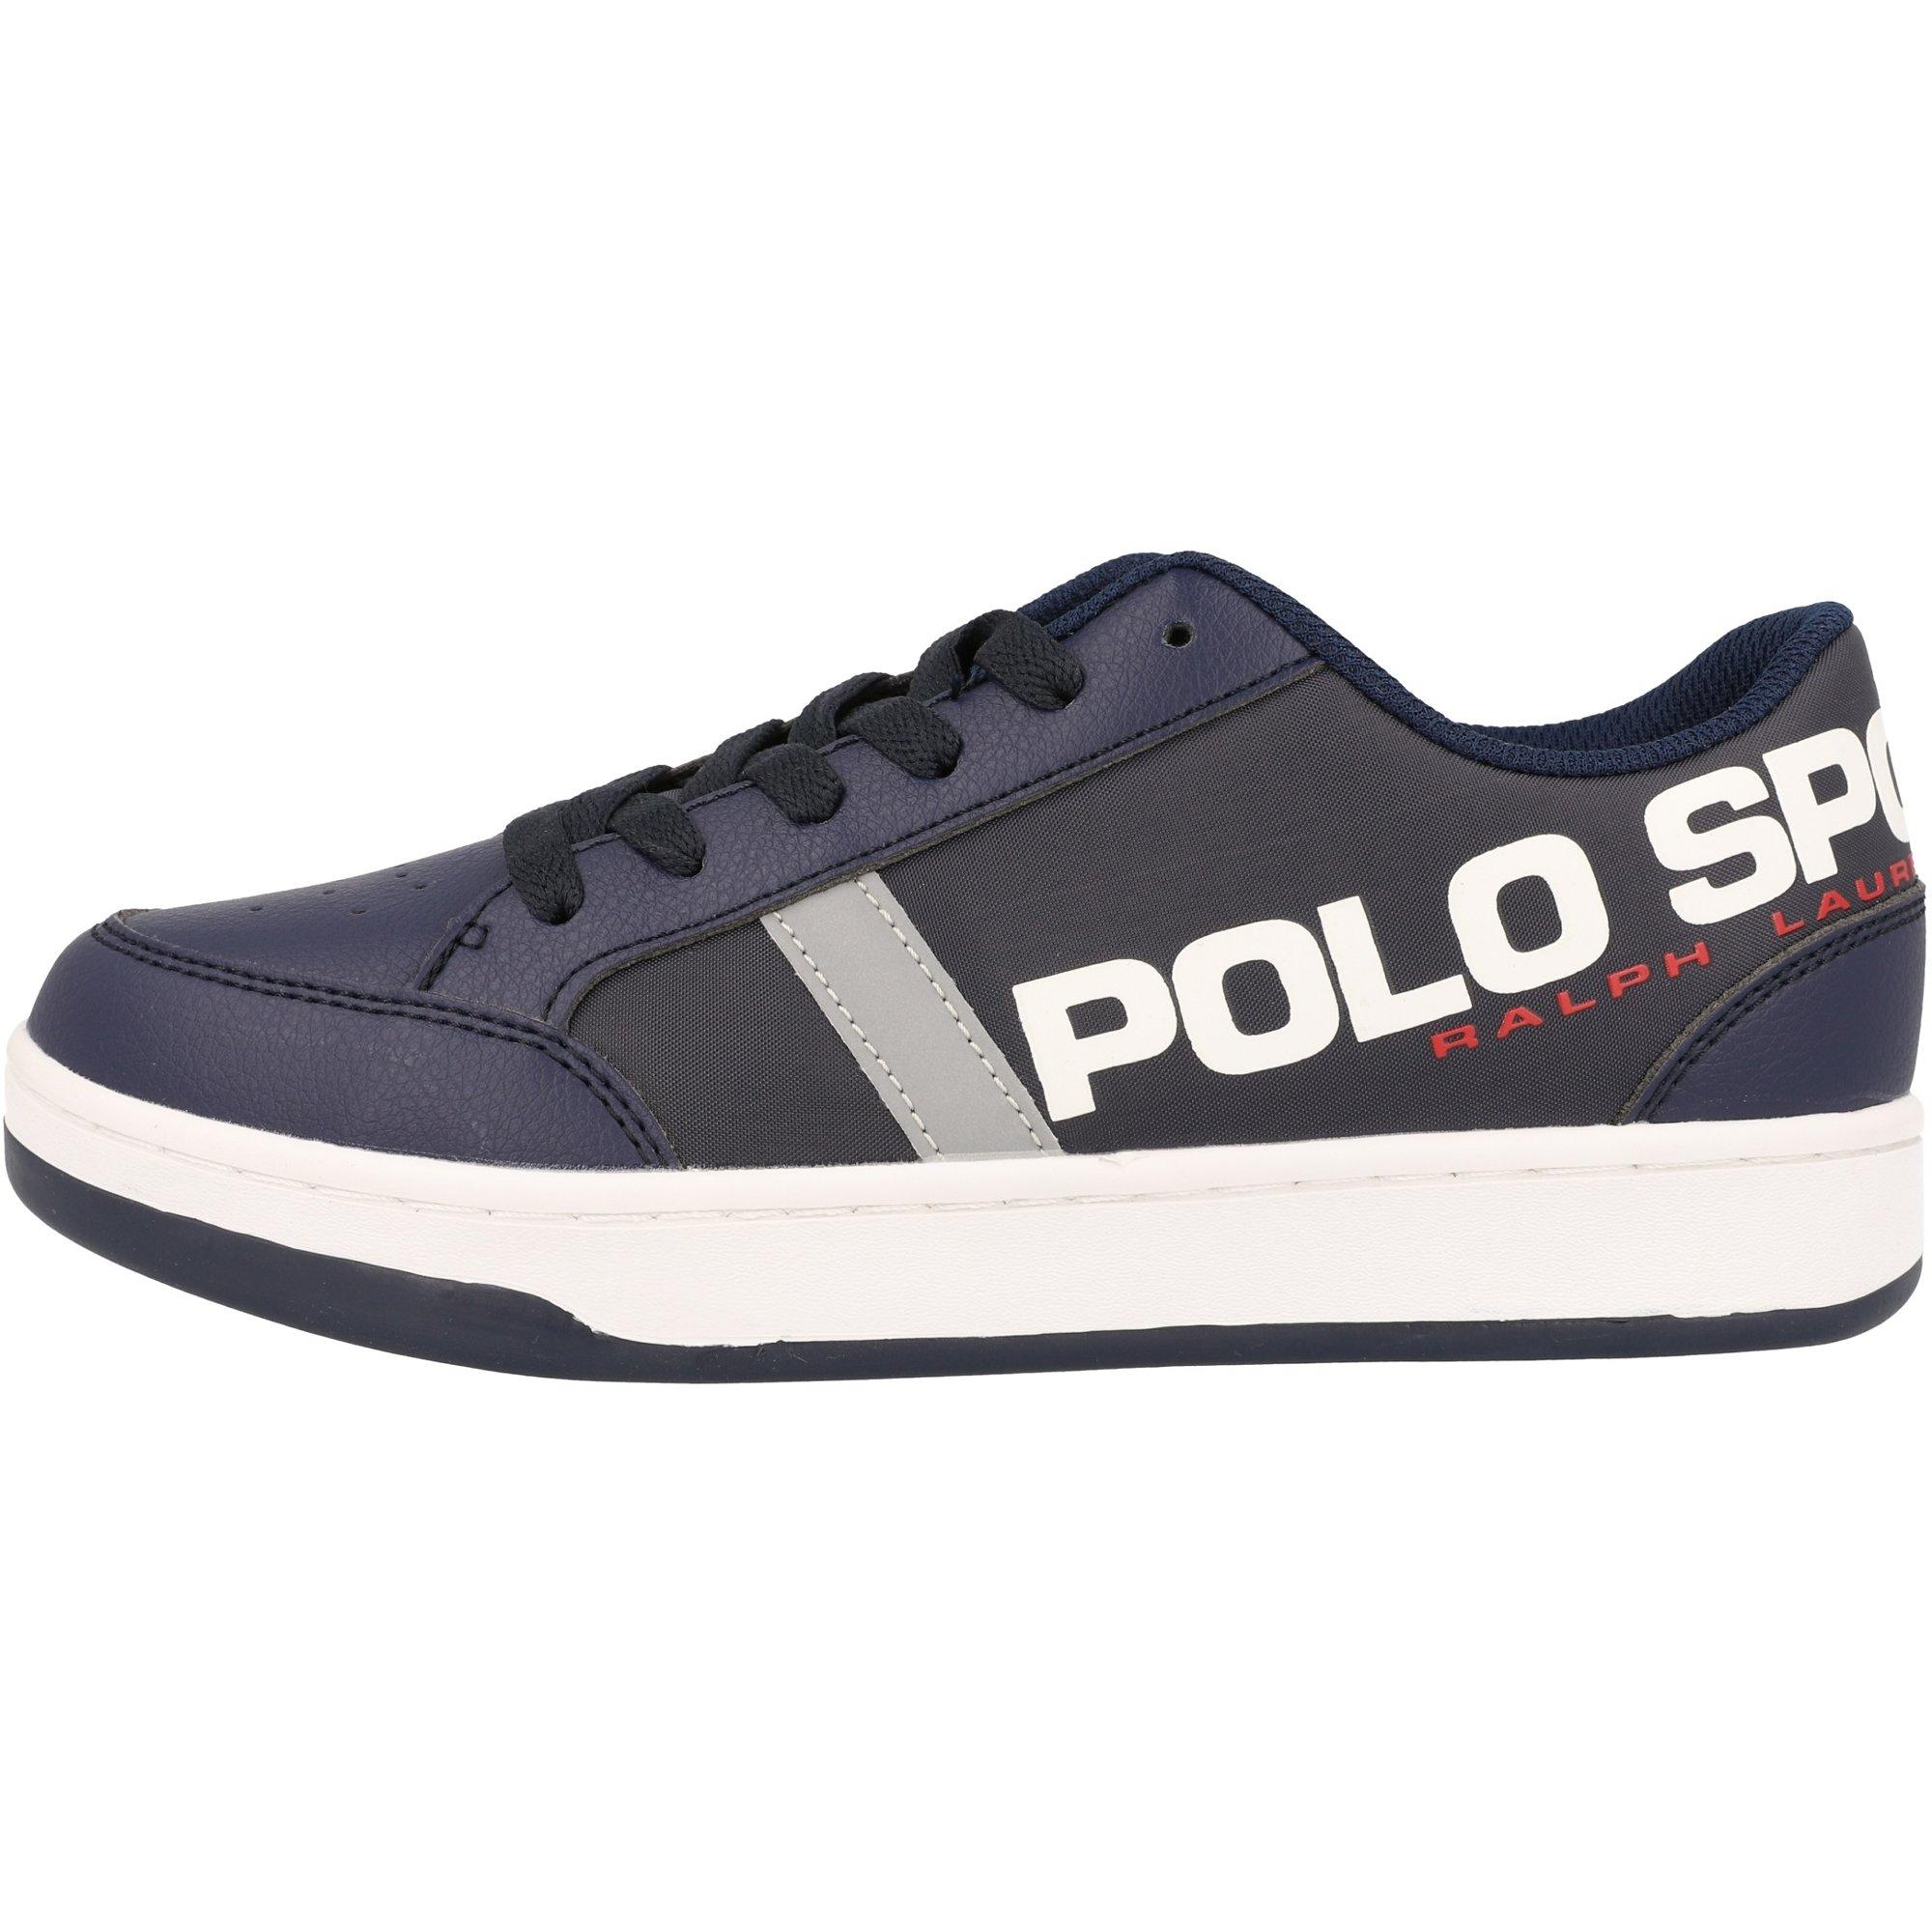 Polo Ralph Lauren Belden J Navy/Silver Tumbled